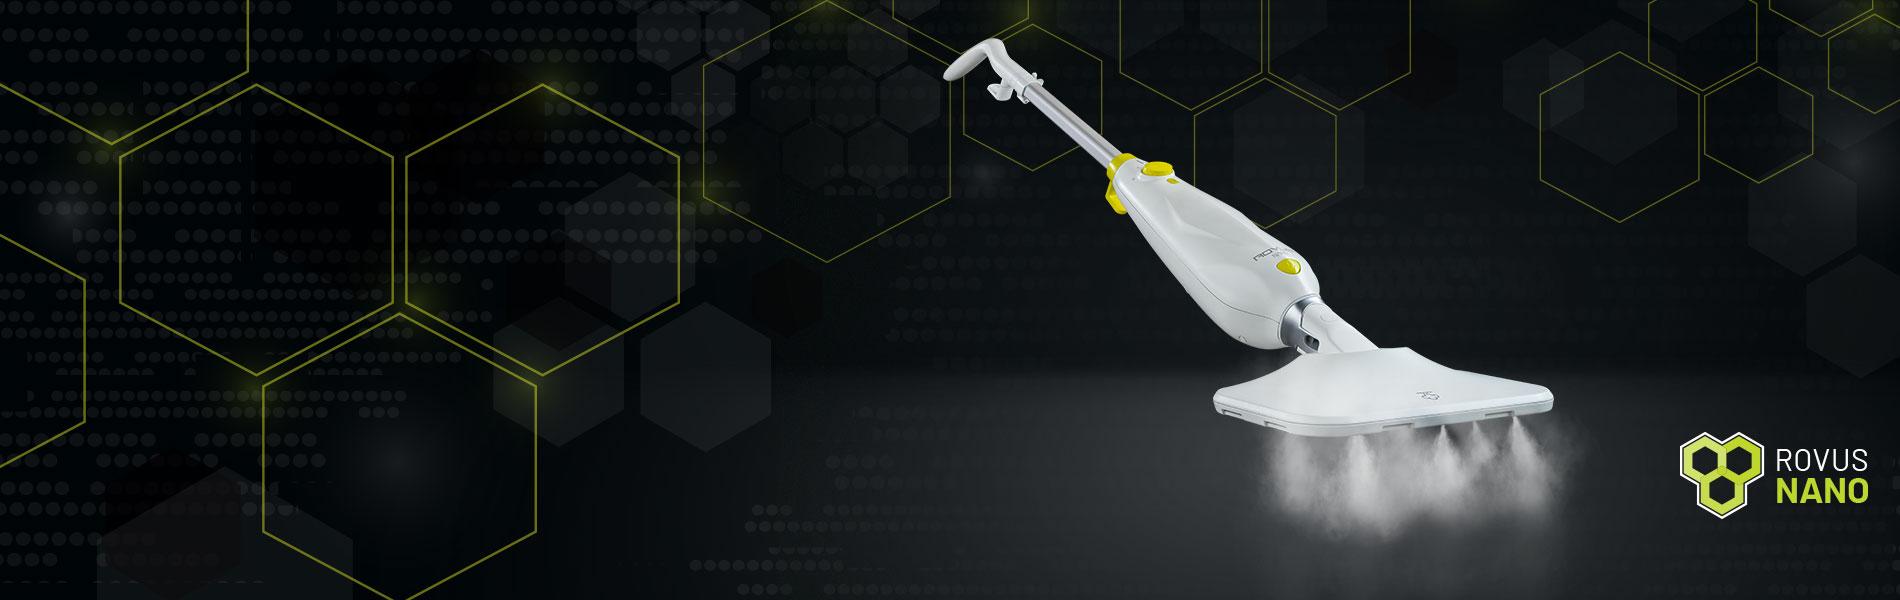 Паровая швабра Nano Plus